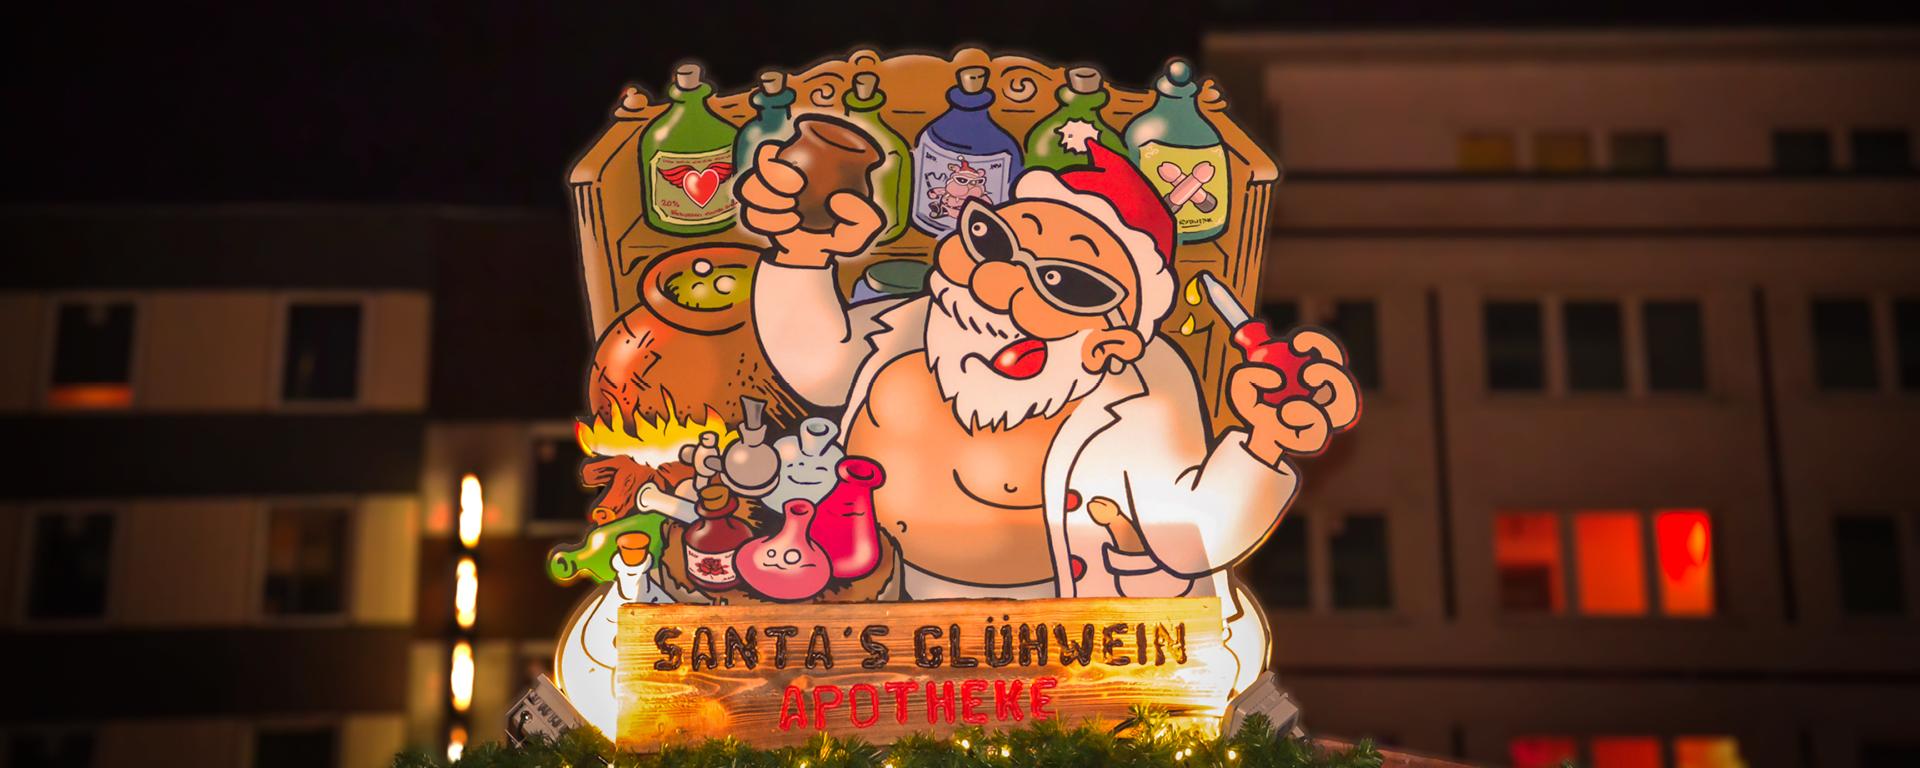 Santa's Glühweinapotheke